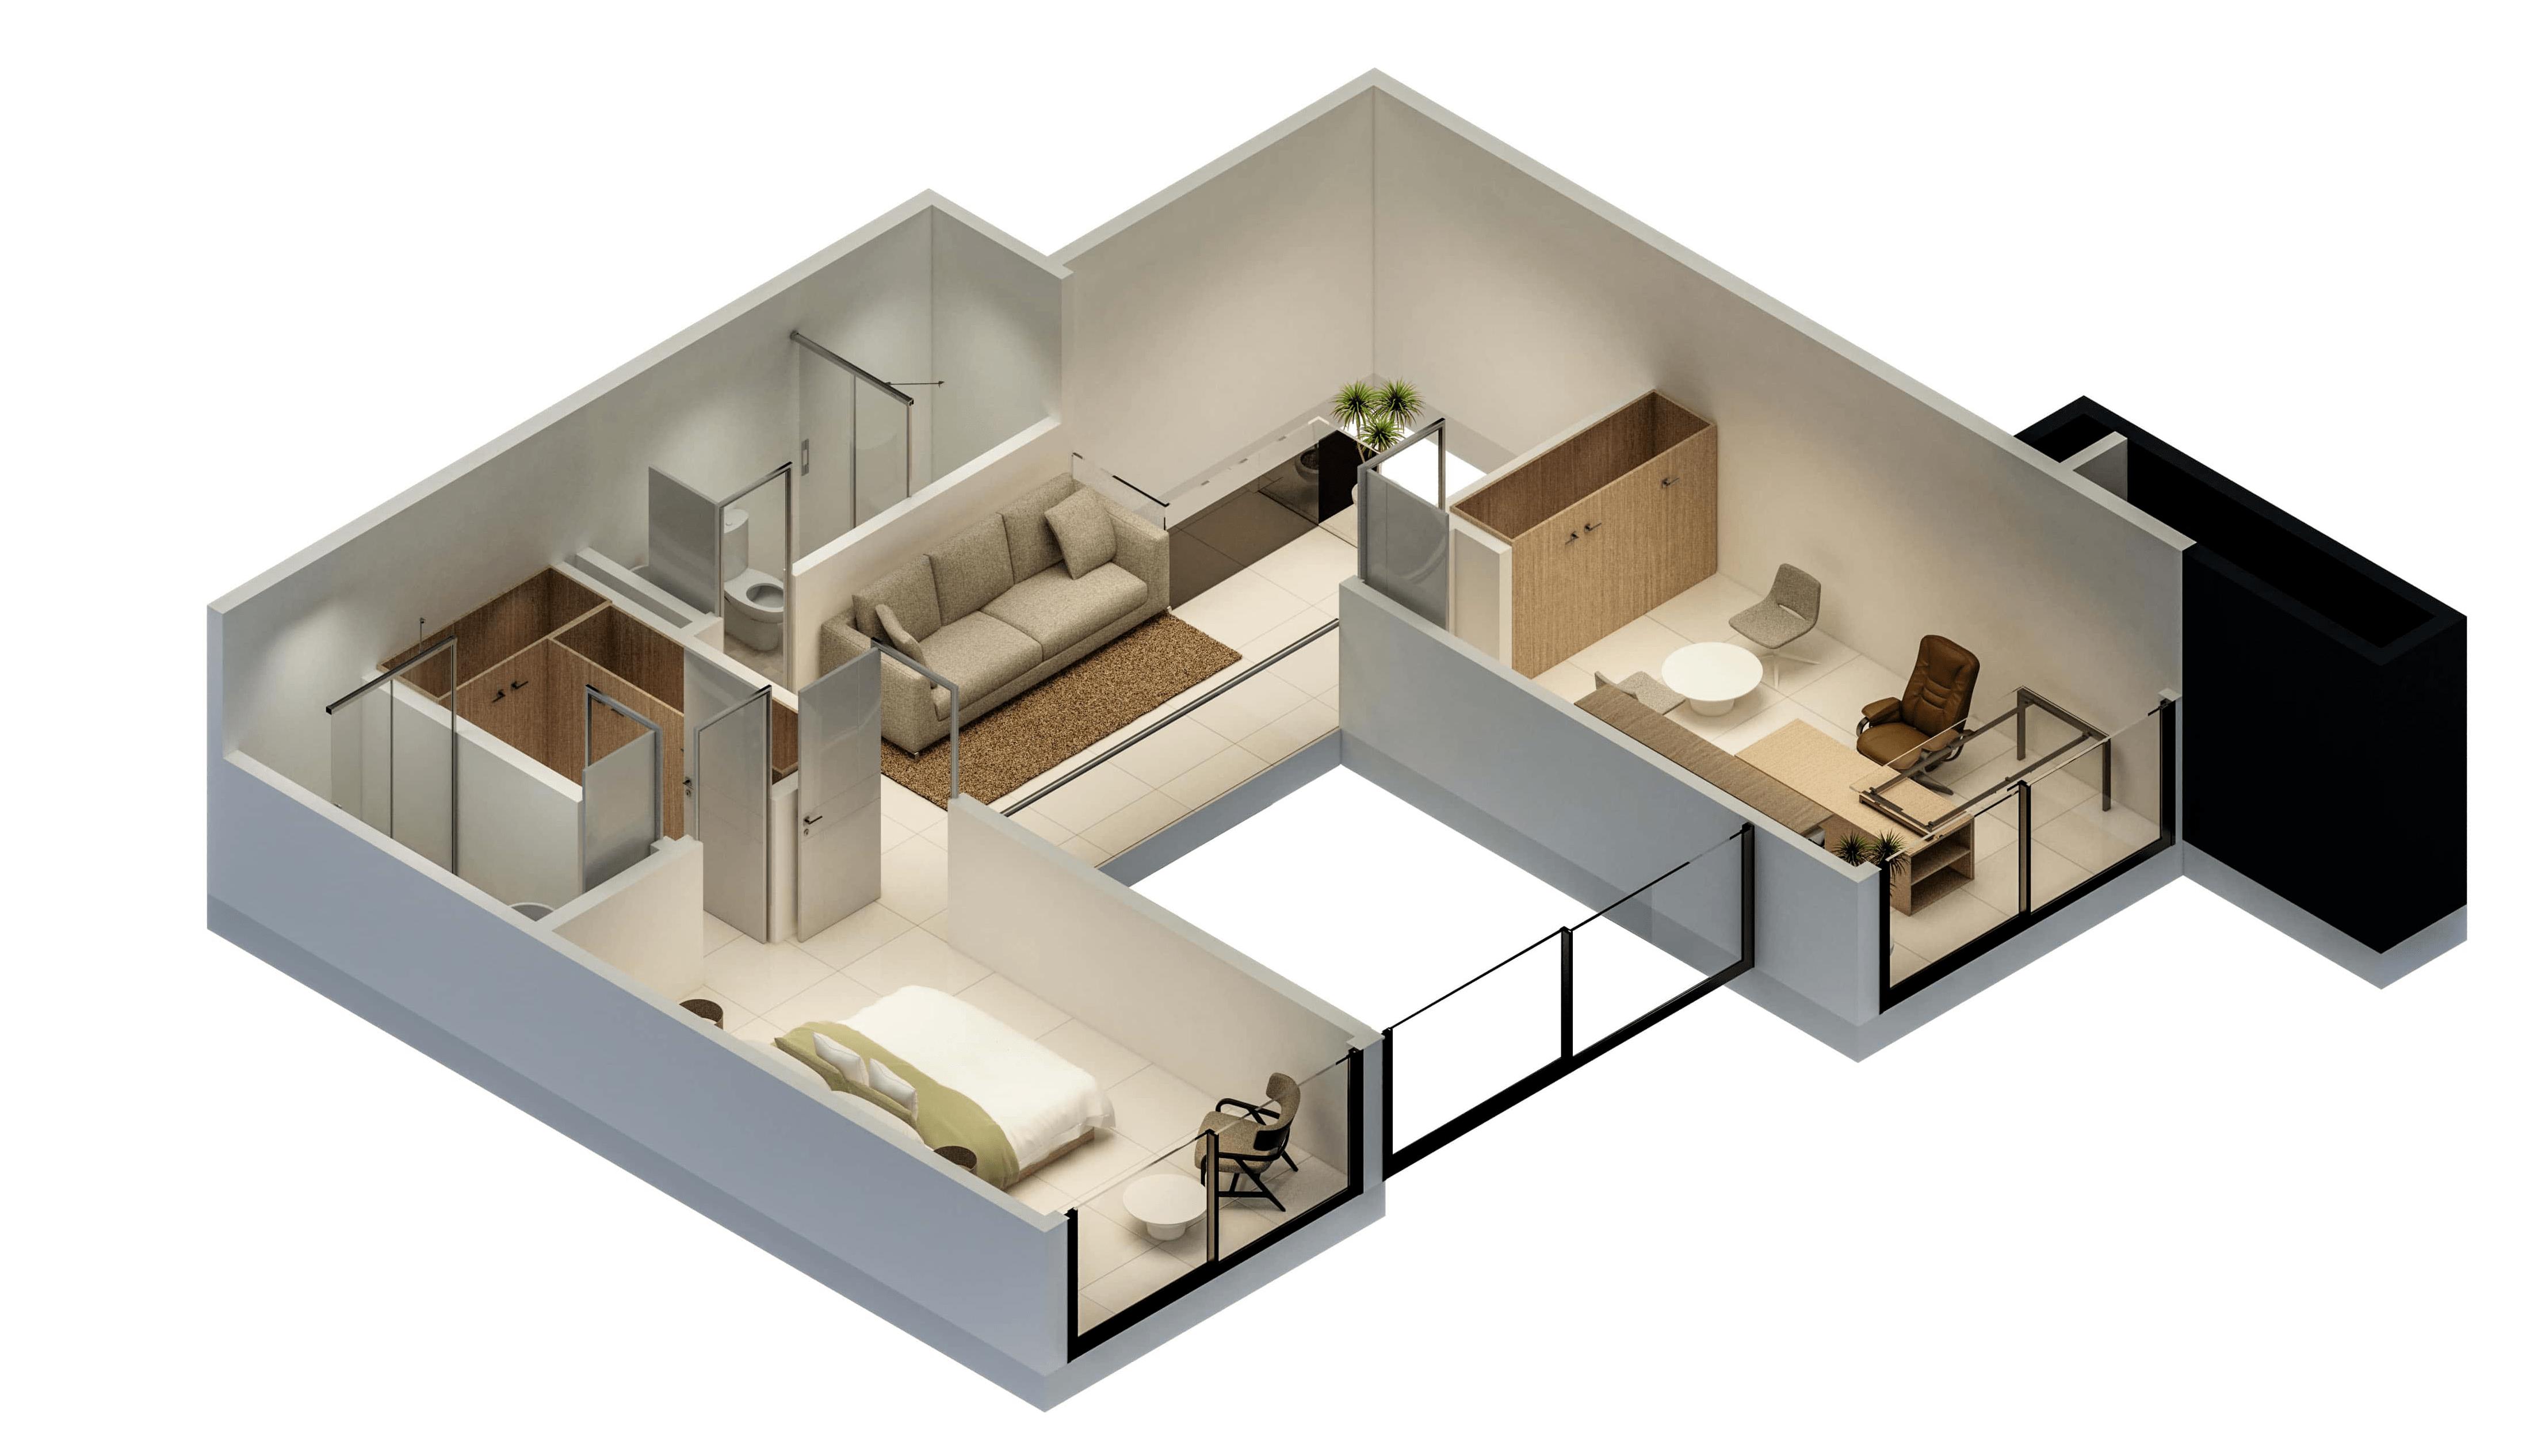 penthouse_4_alcobas_isometrica_1-min